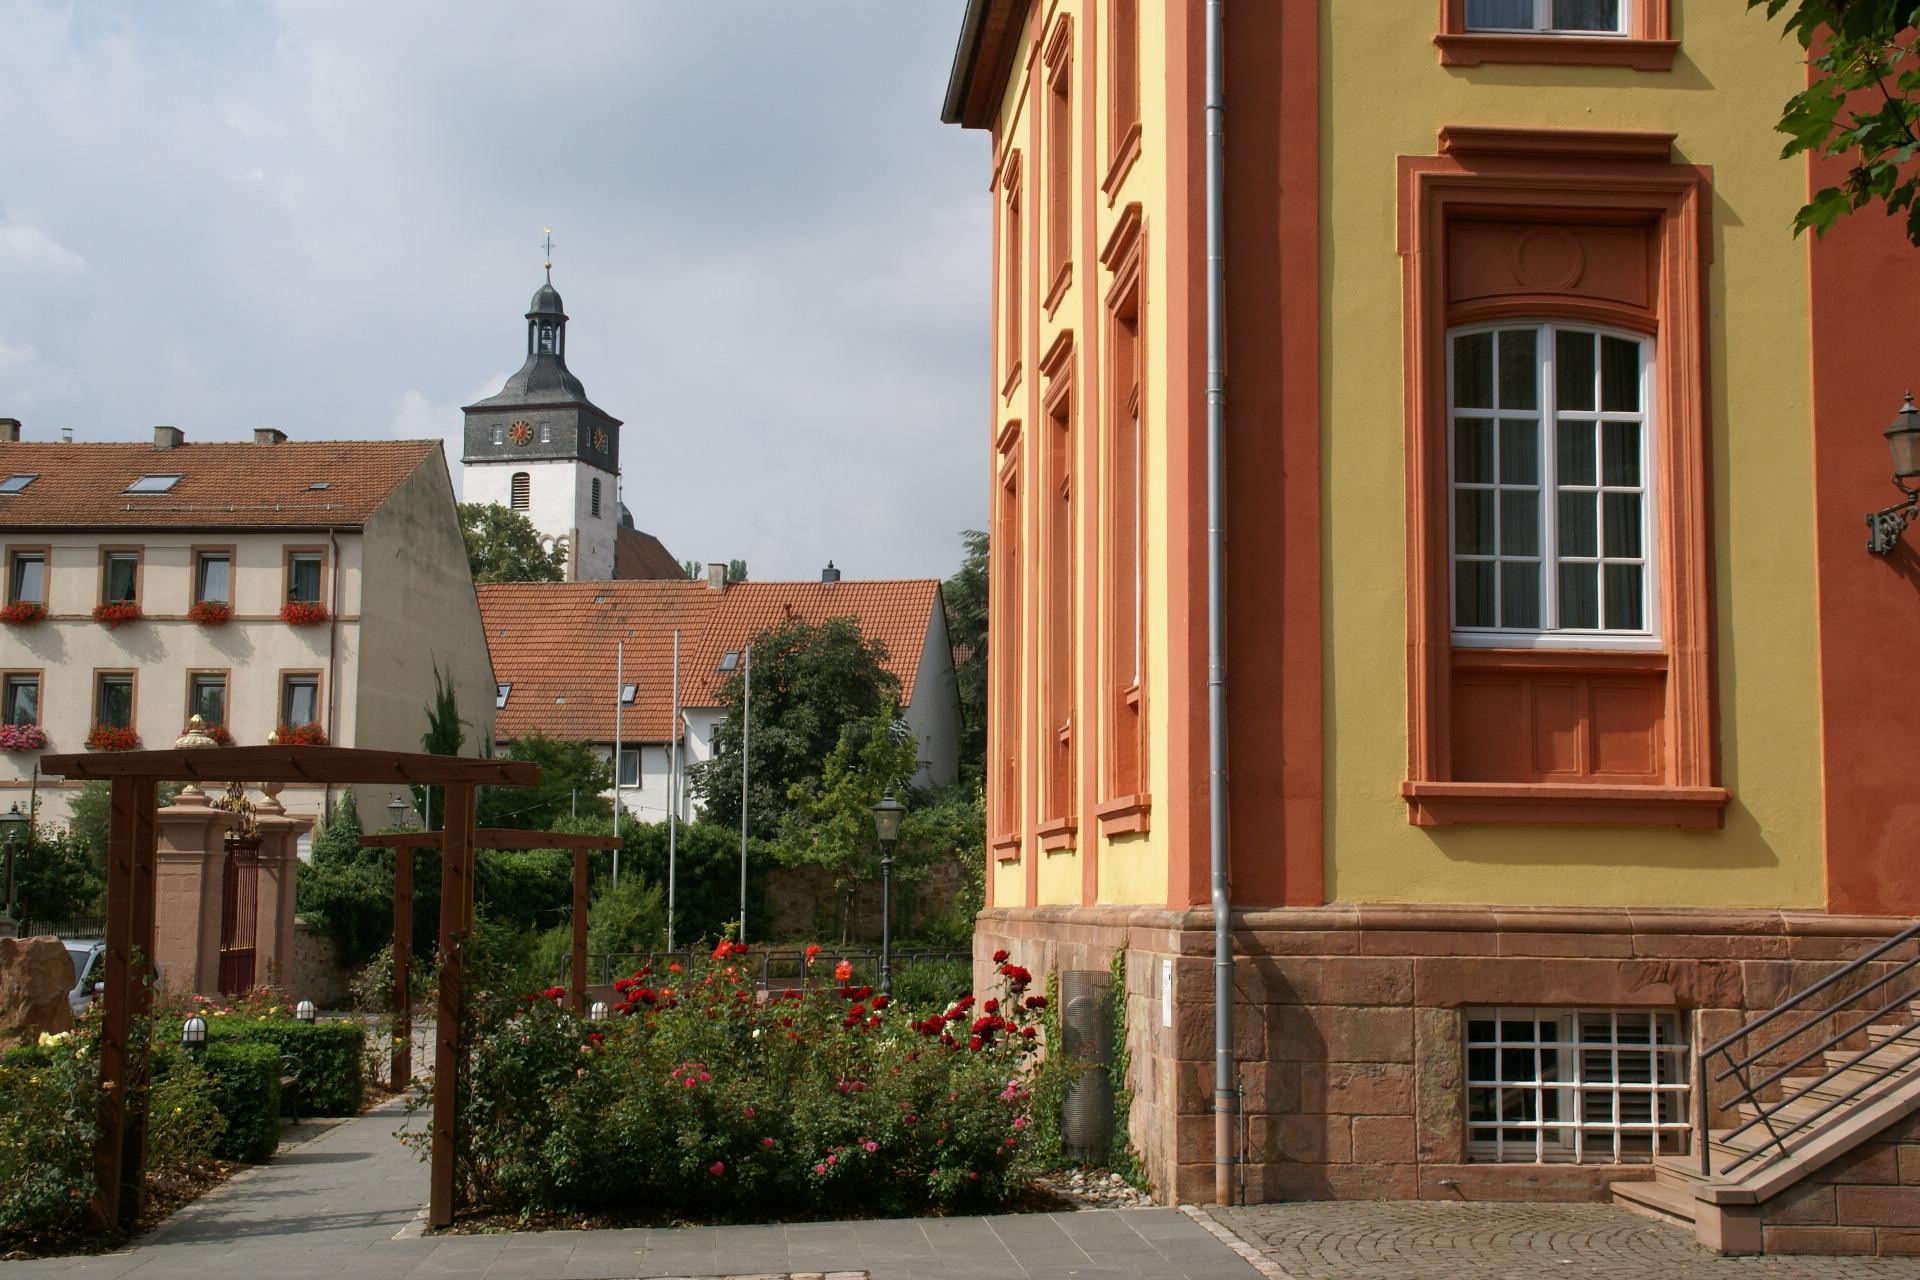 Kirchheimbolanden Germany  city photos gallery : ... :2009.08.14.103817 Schloss Kirchheimbolanden Wikimedia Commons